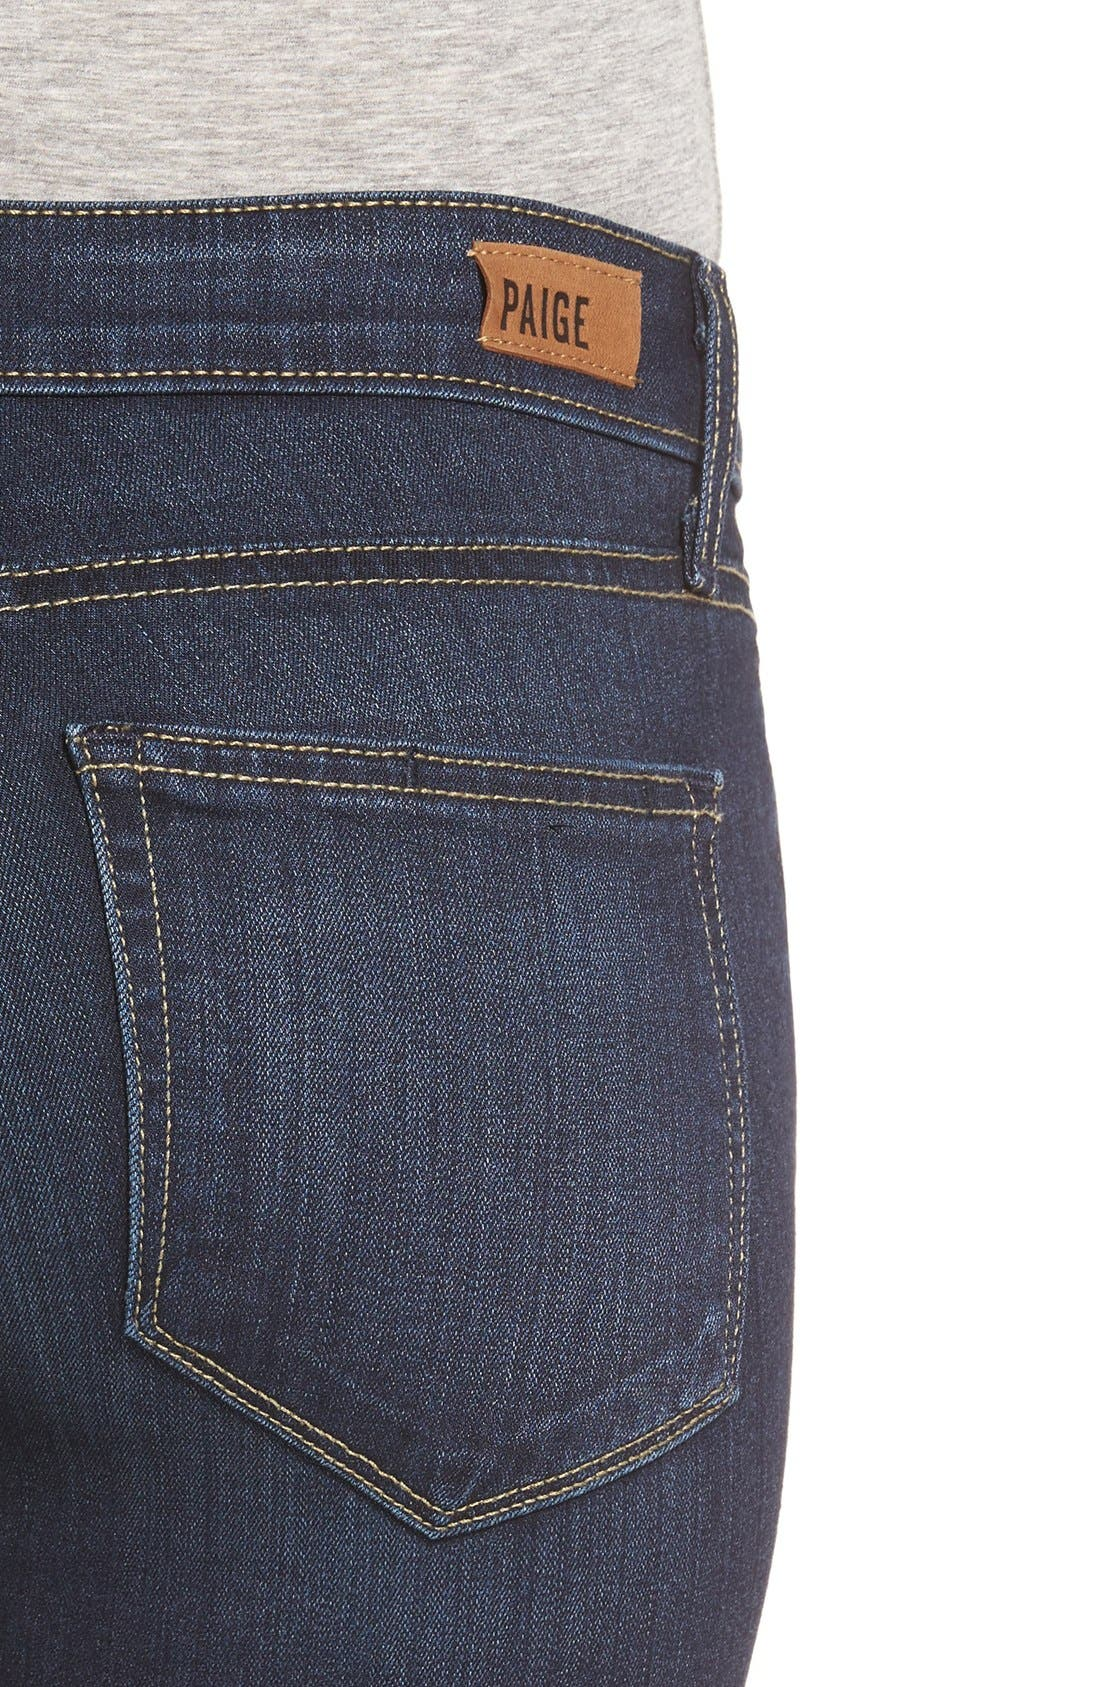 Alternate Image 5  - PAIGE 'Transcend - Verdugo' Ankle Ultra Skinny Jeans (Hartmann) (Nordstrom Exclusive)